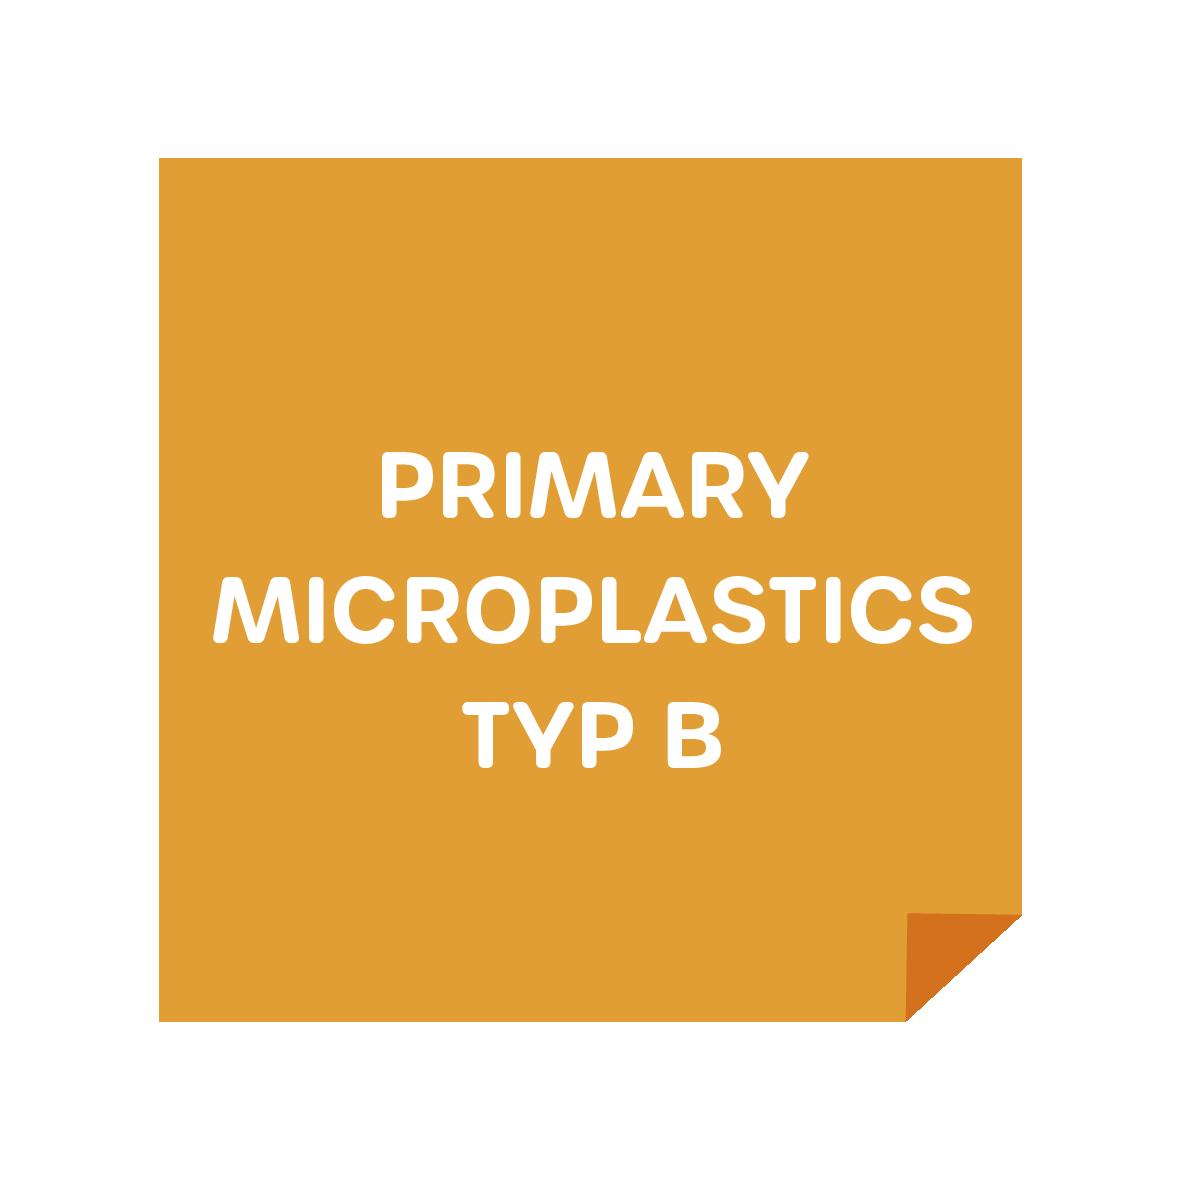 Primary Microplastics Typ B